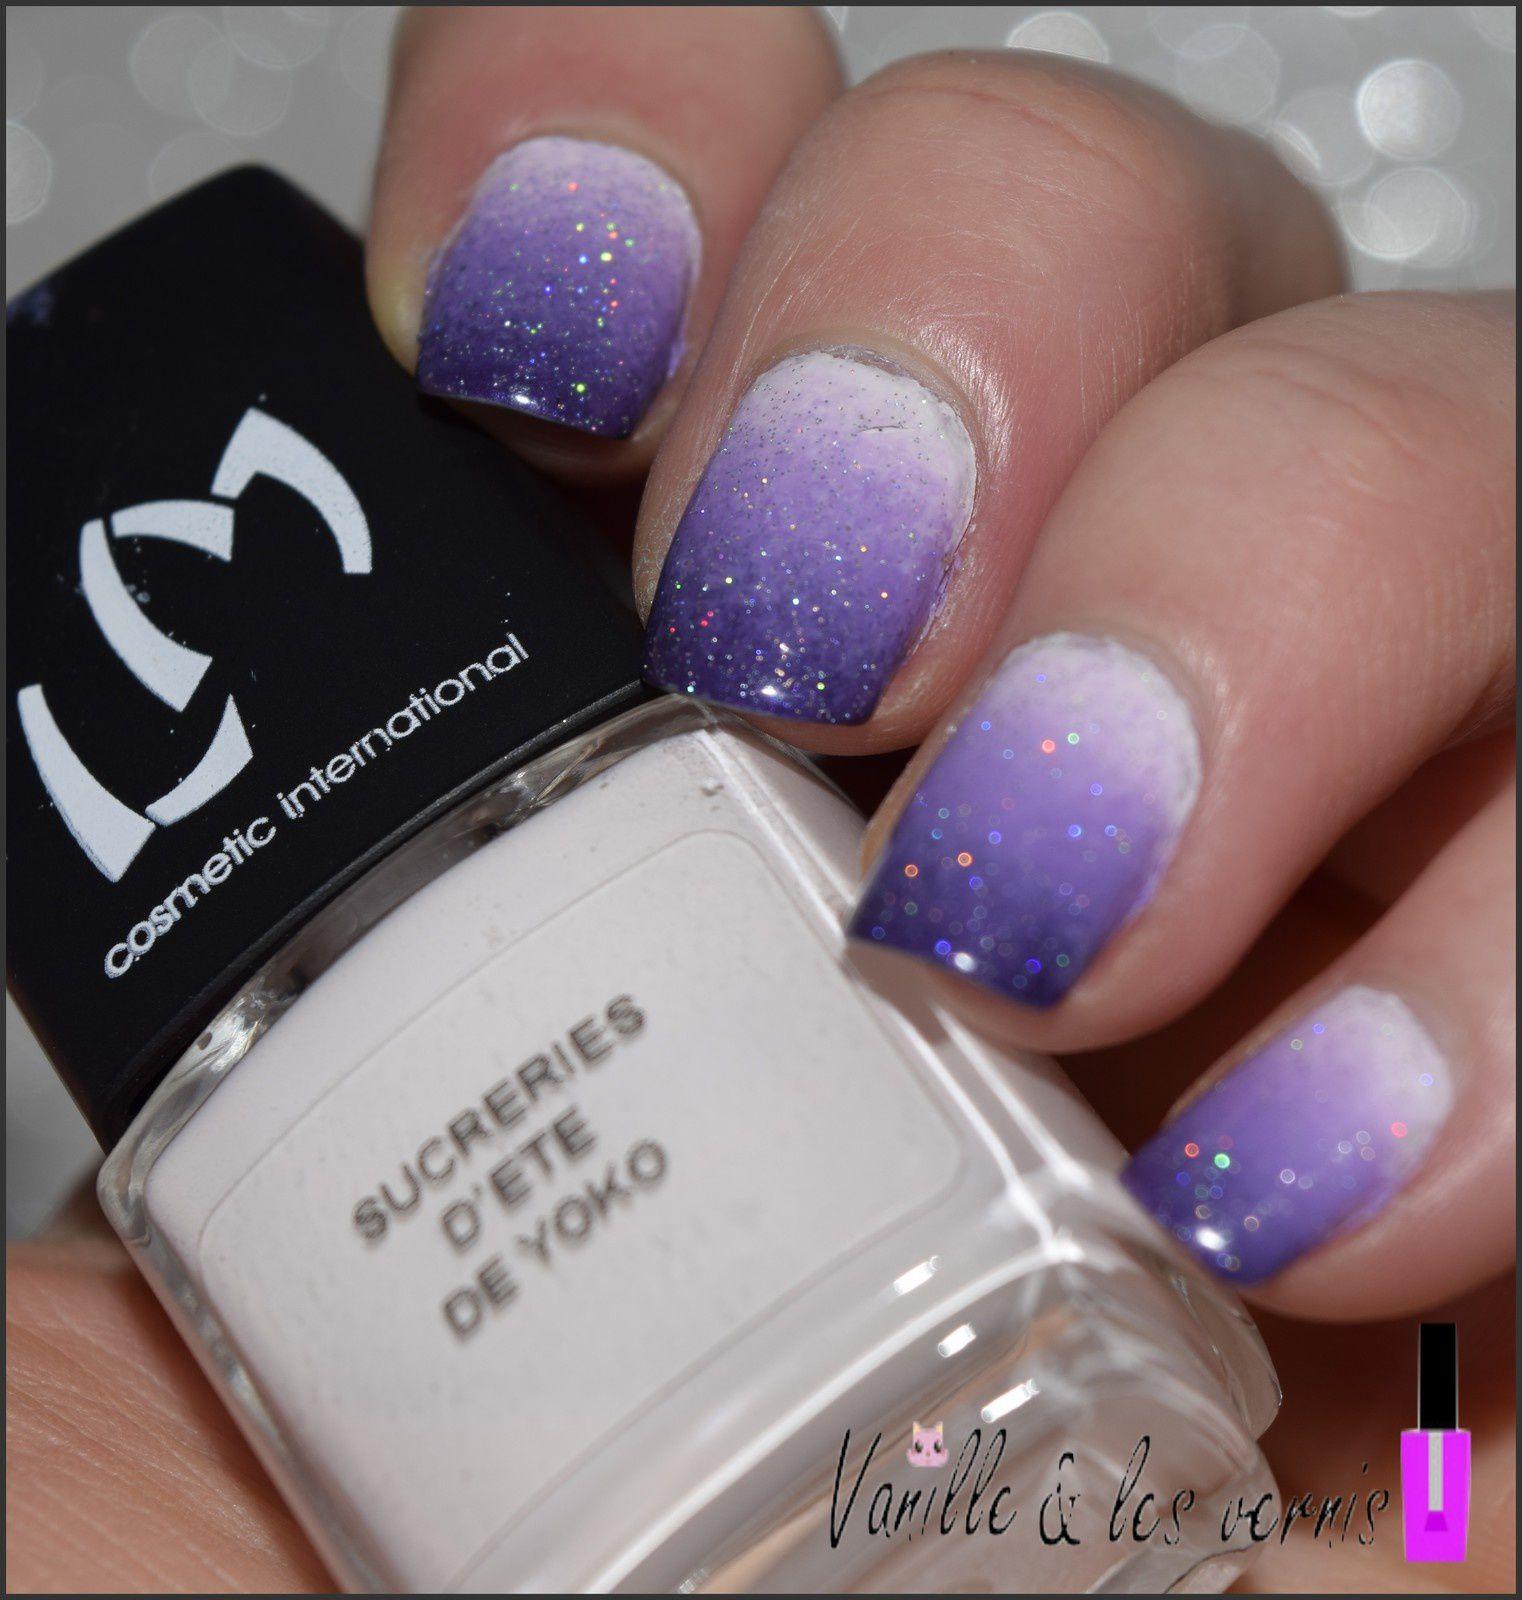 Amethyst nails